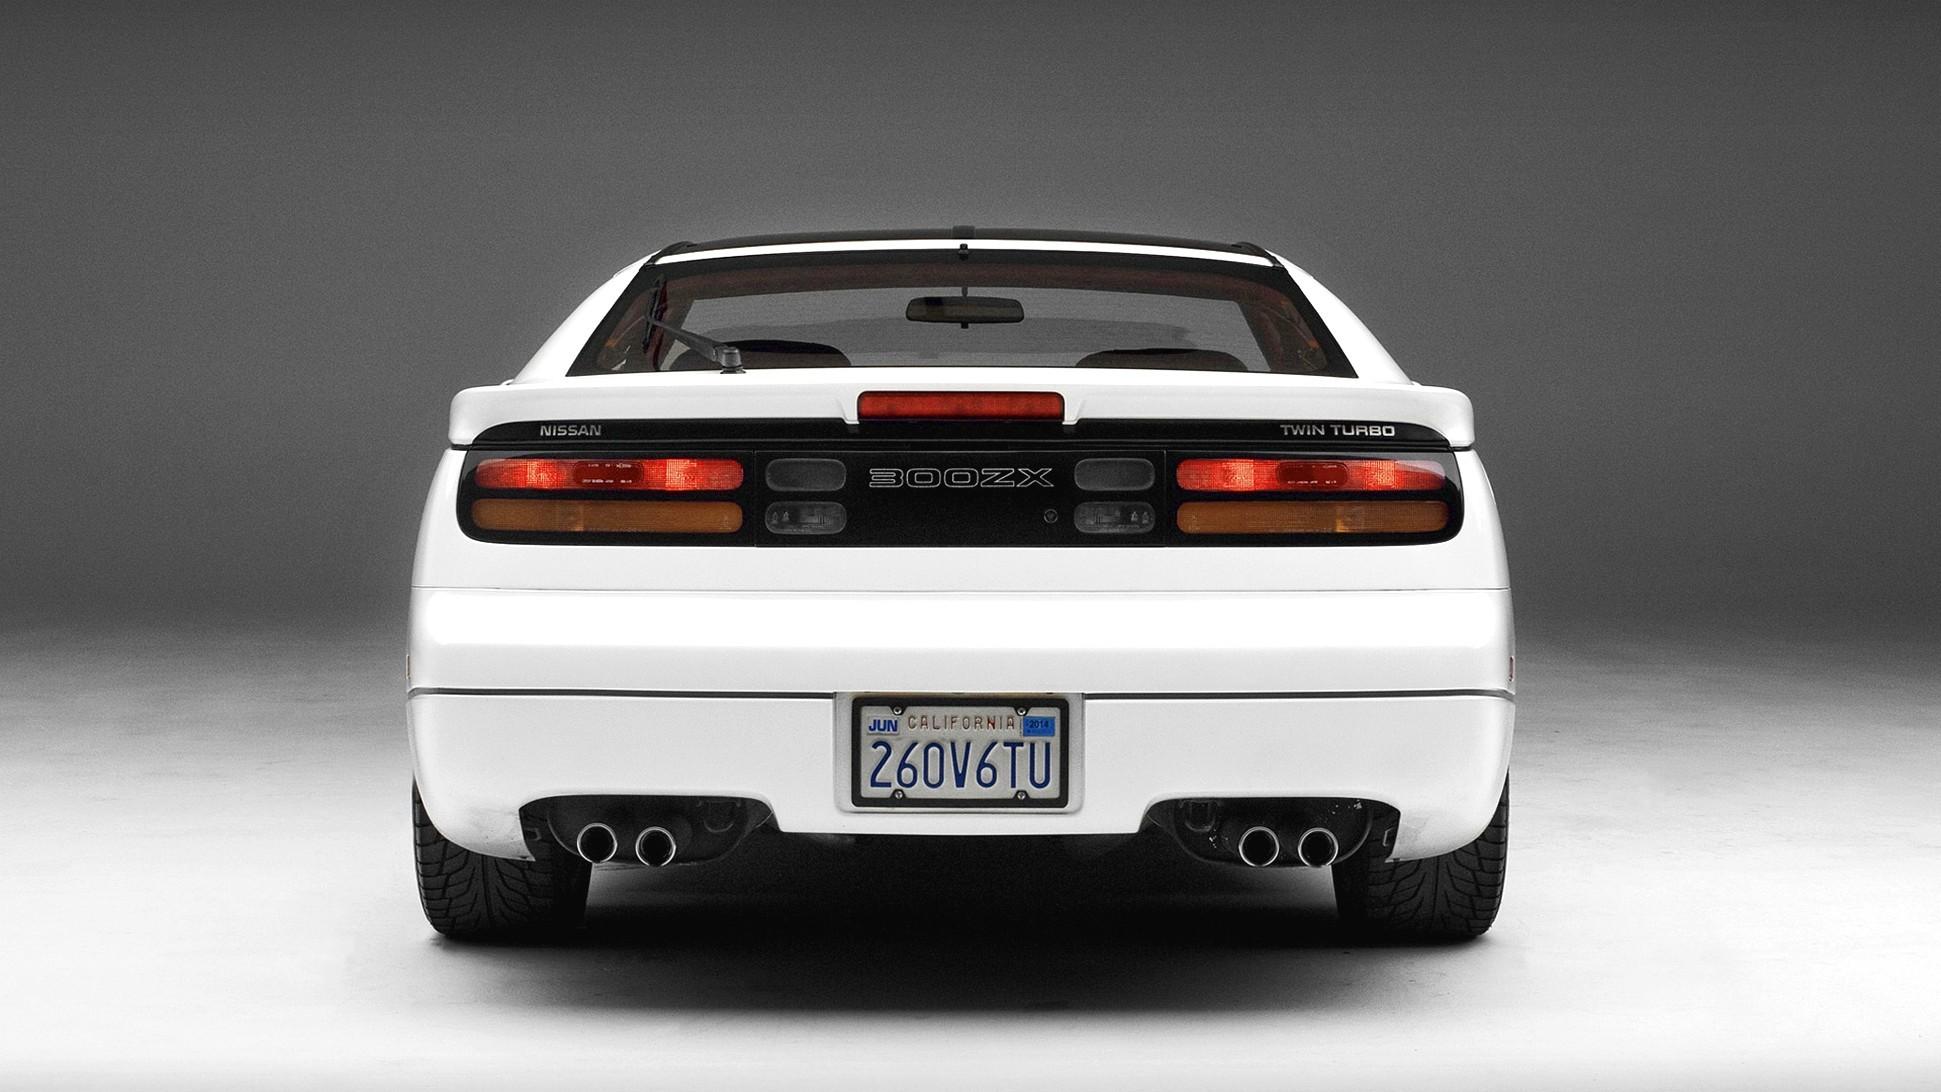 1990 Nissan 300zx V8 Hd Car Wallpaper